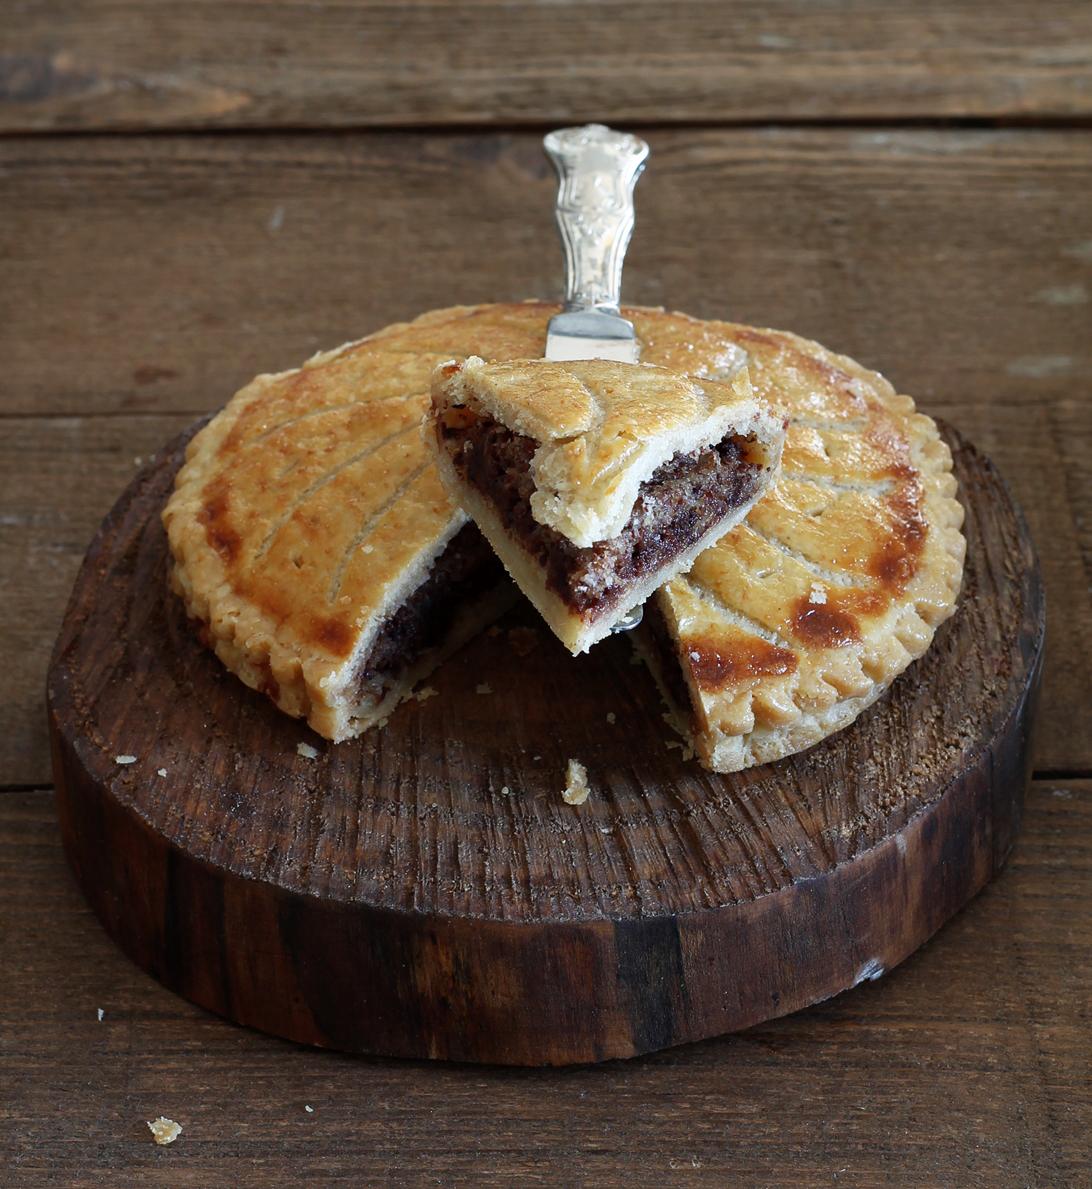 Galette de rois senza glutine al cioccolato - La Cassata Celiaca